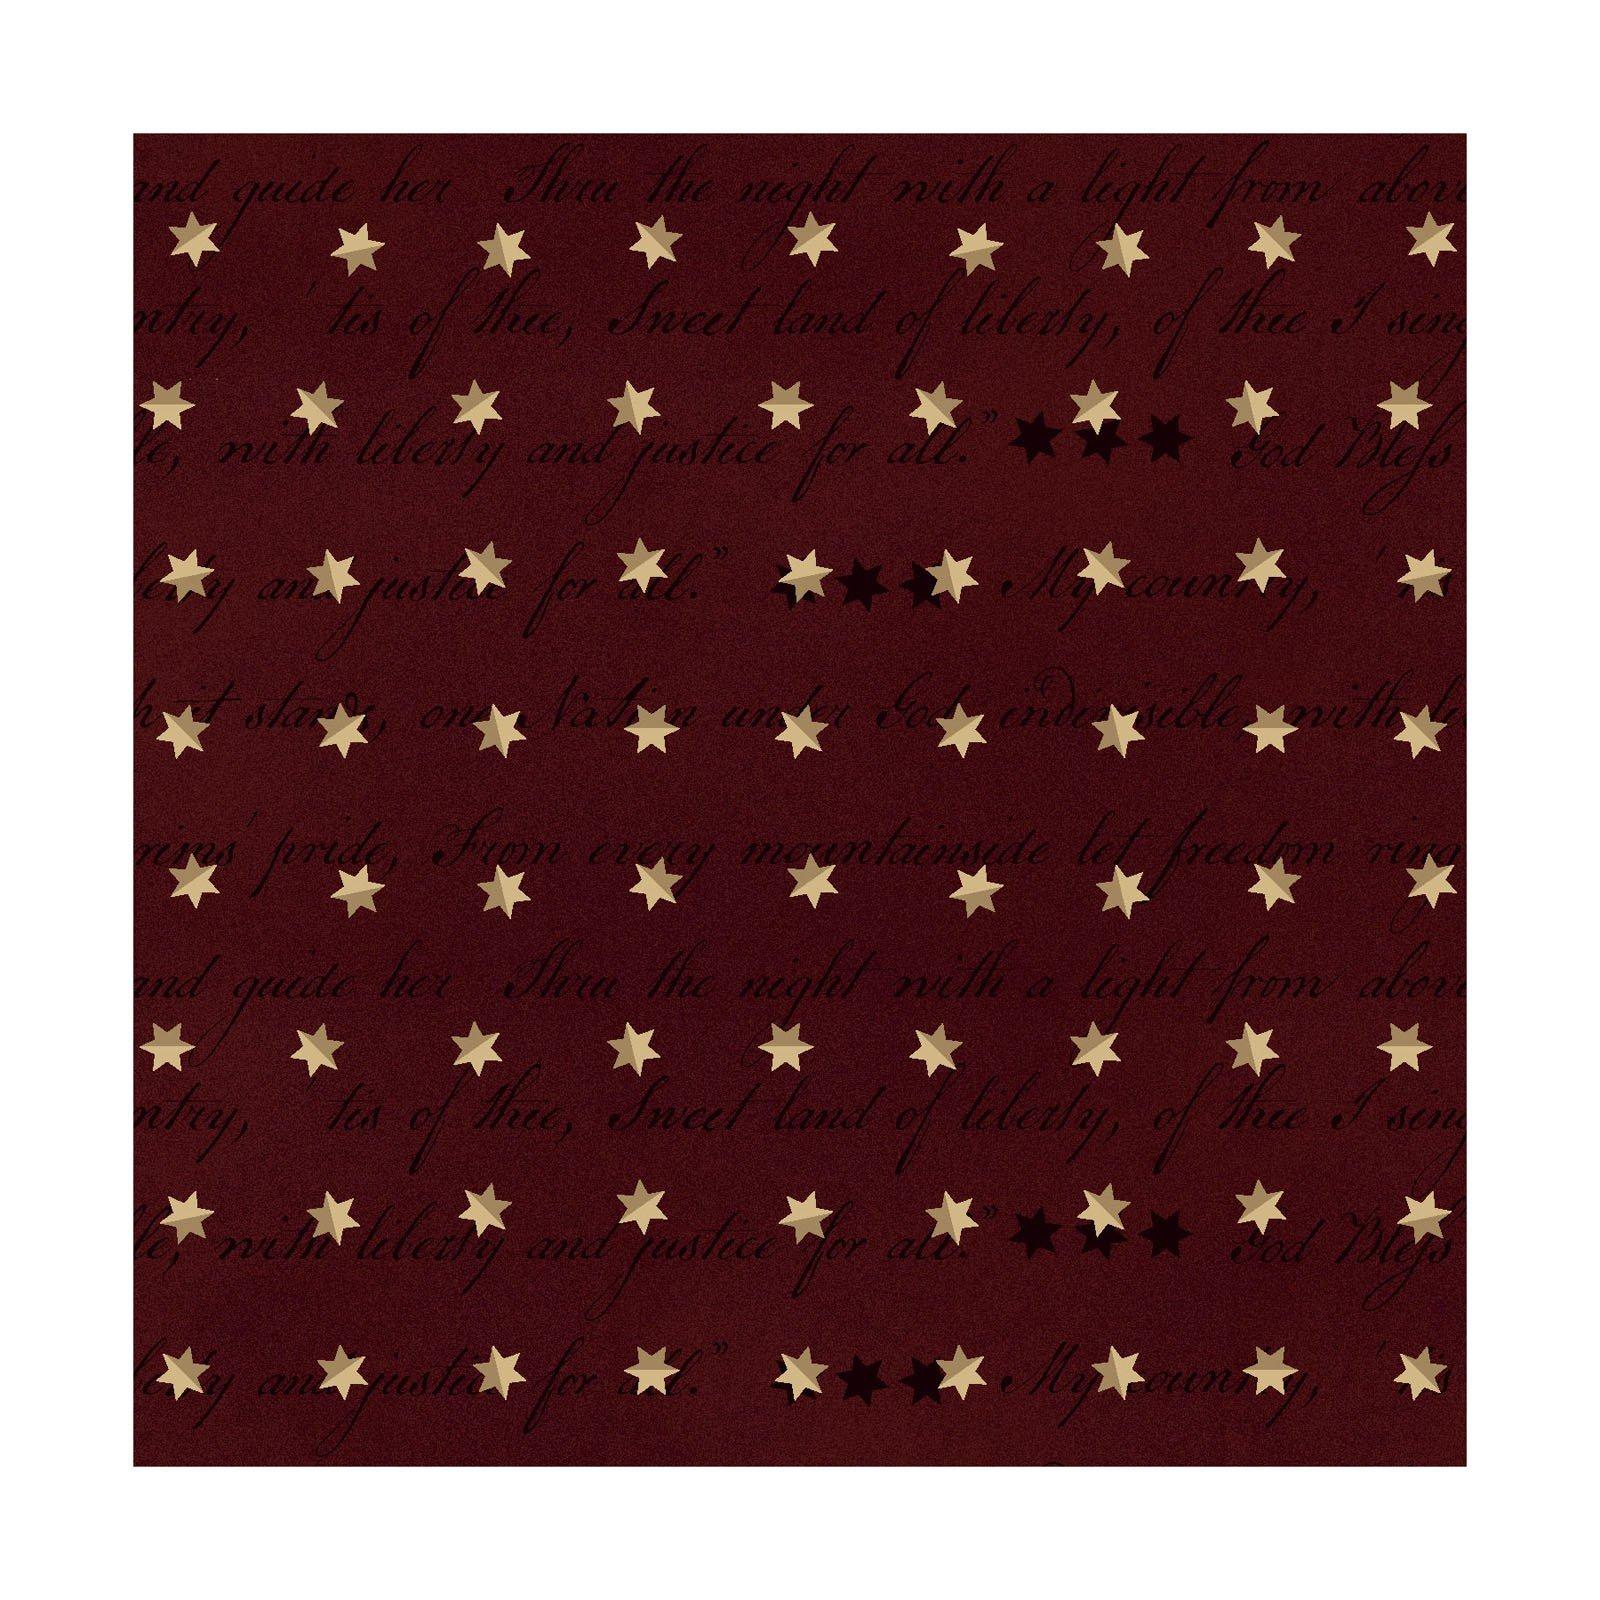 Spirit of America - Dk Red<br/>Henry Glass 8866-88